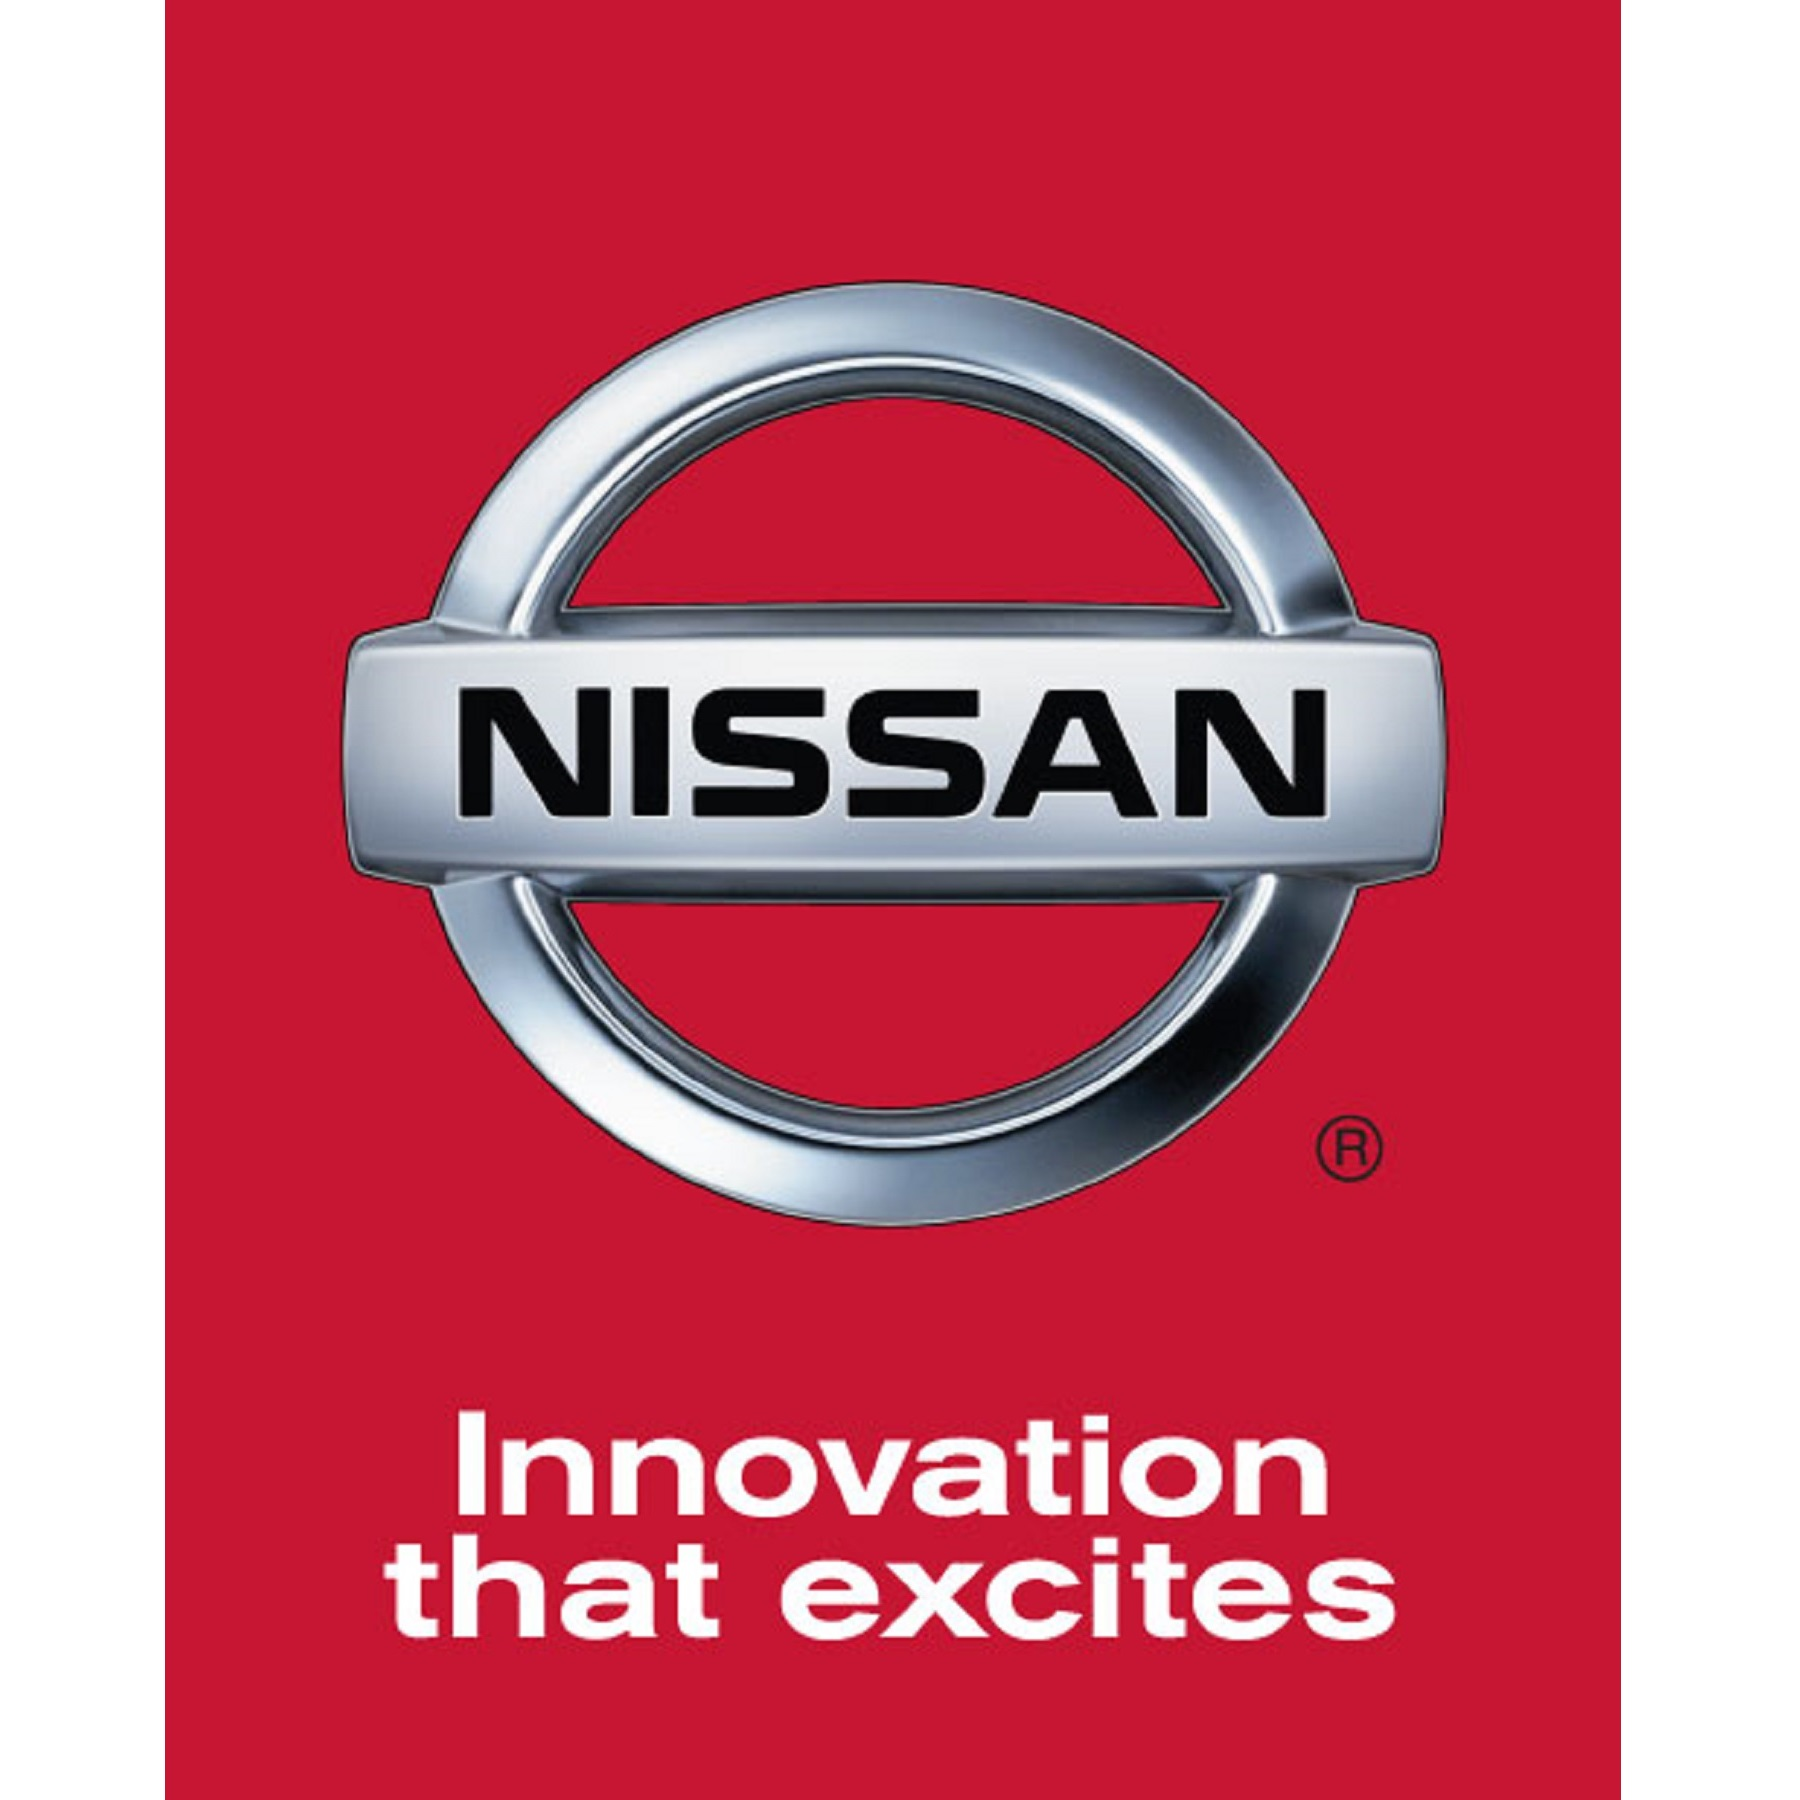 Nissan tablet